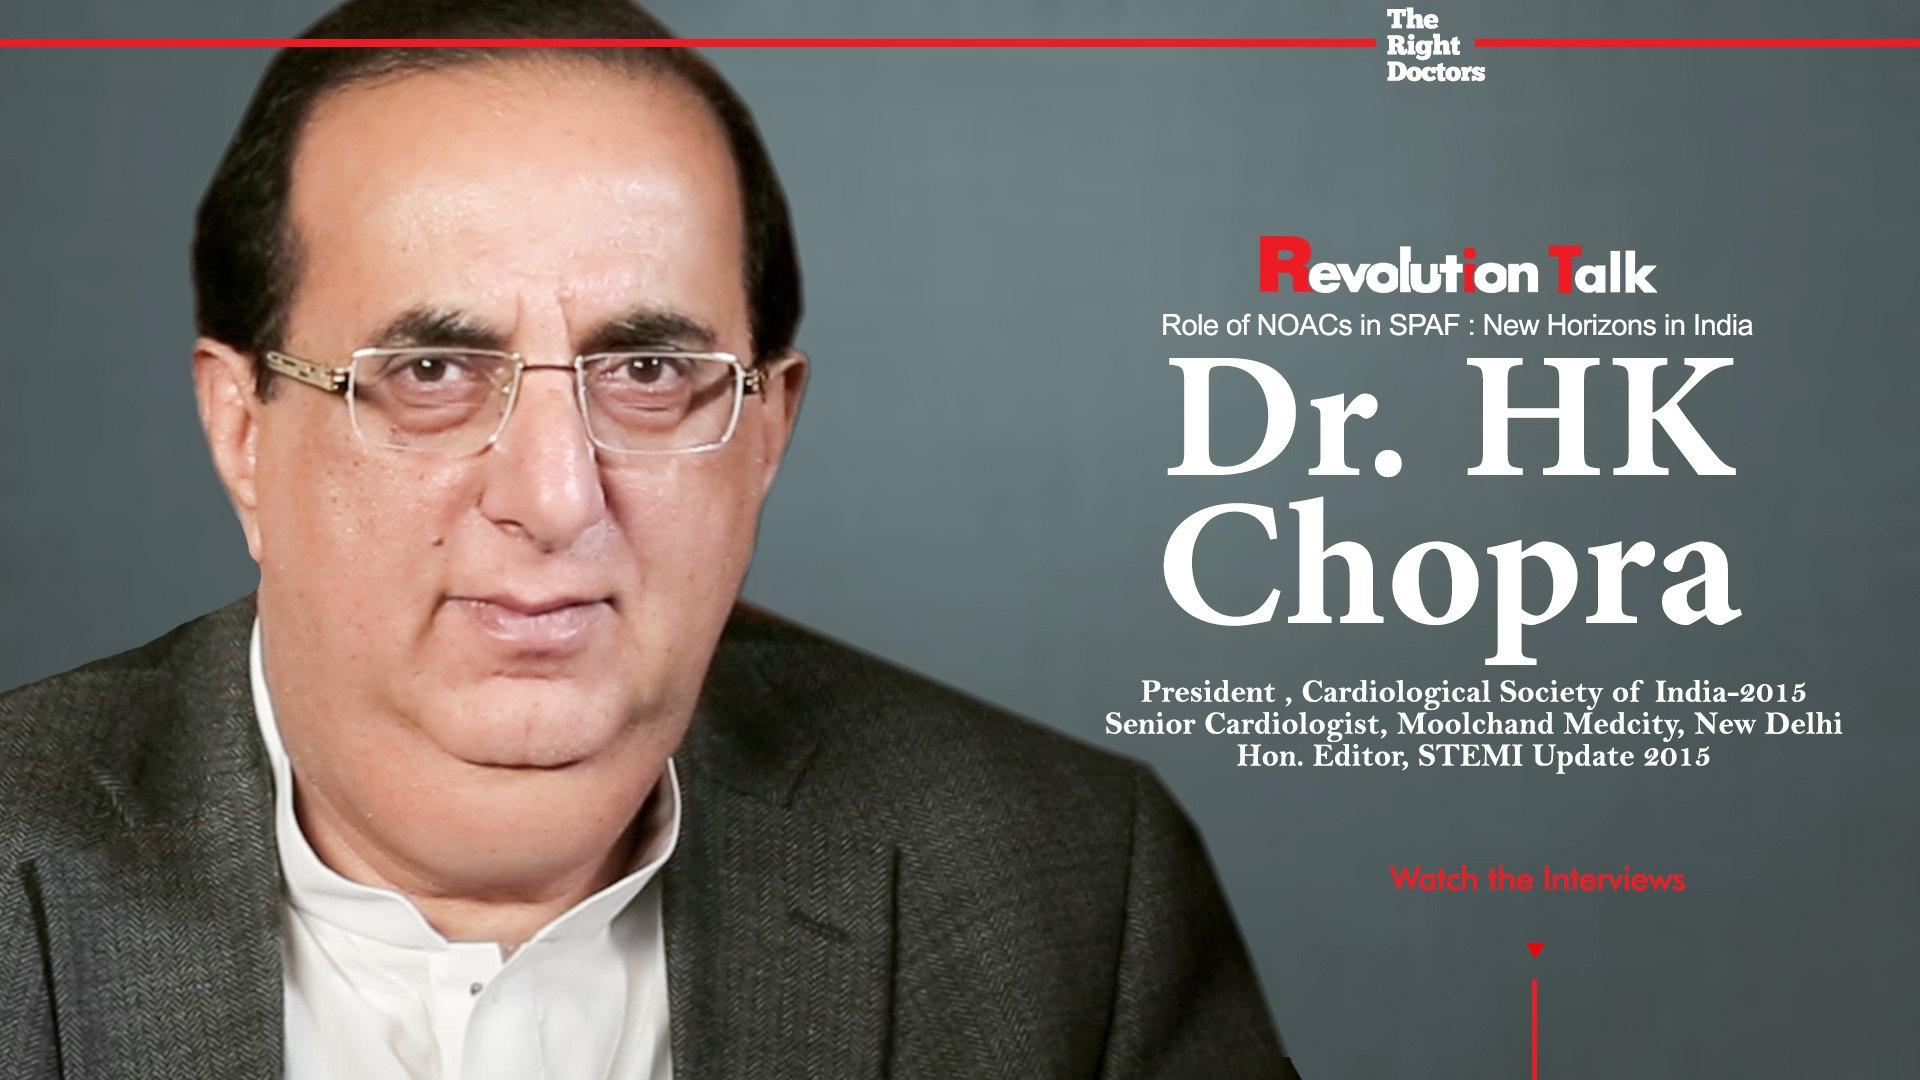 """Dr. HK Chopra President , Cardiological Society of India-2015 Senior Cardiologist, Moolchand Medcity, New Delhi Hon. Editor, STEMI Update 2015"